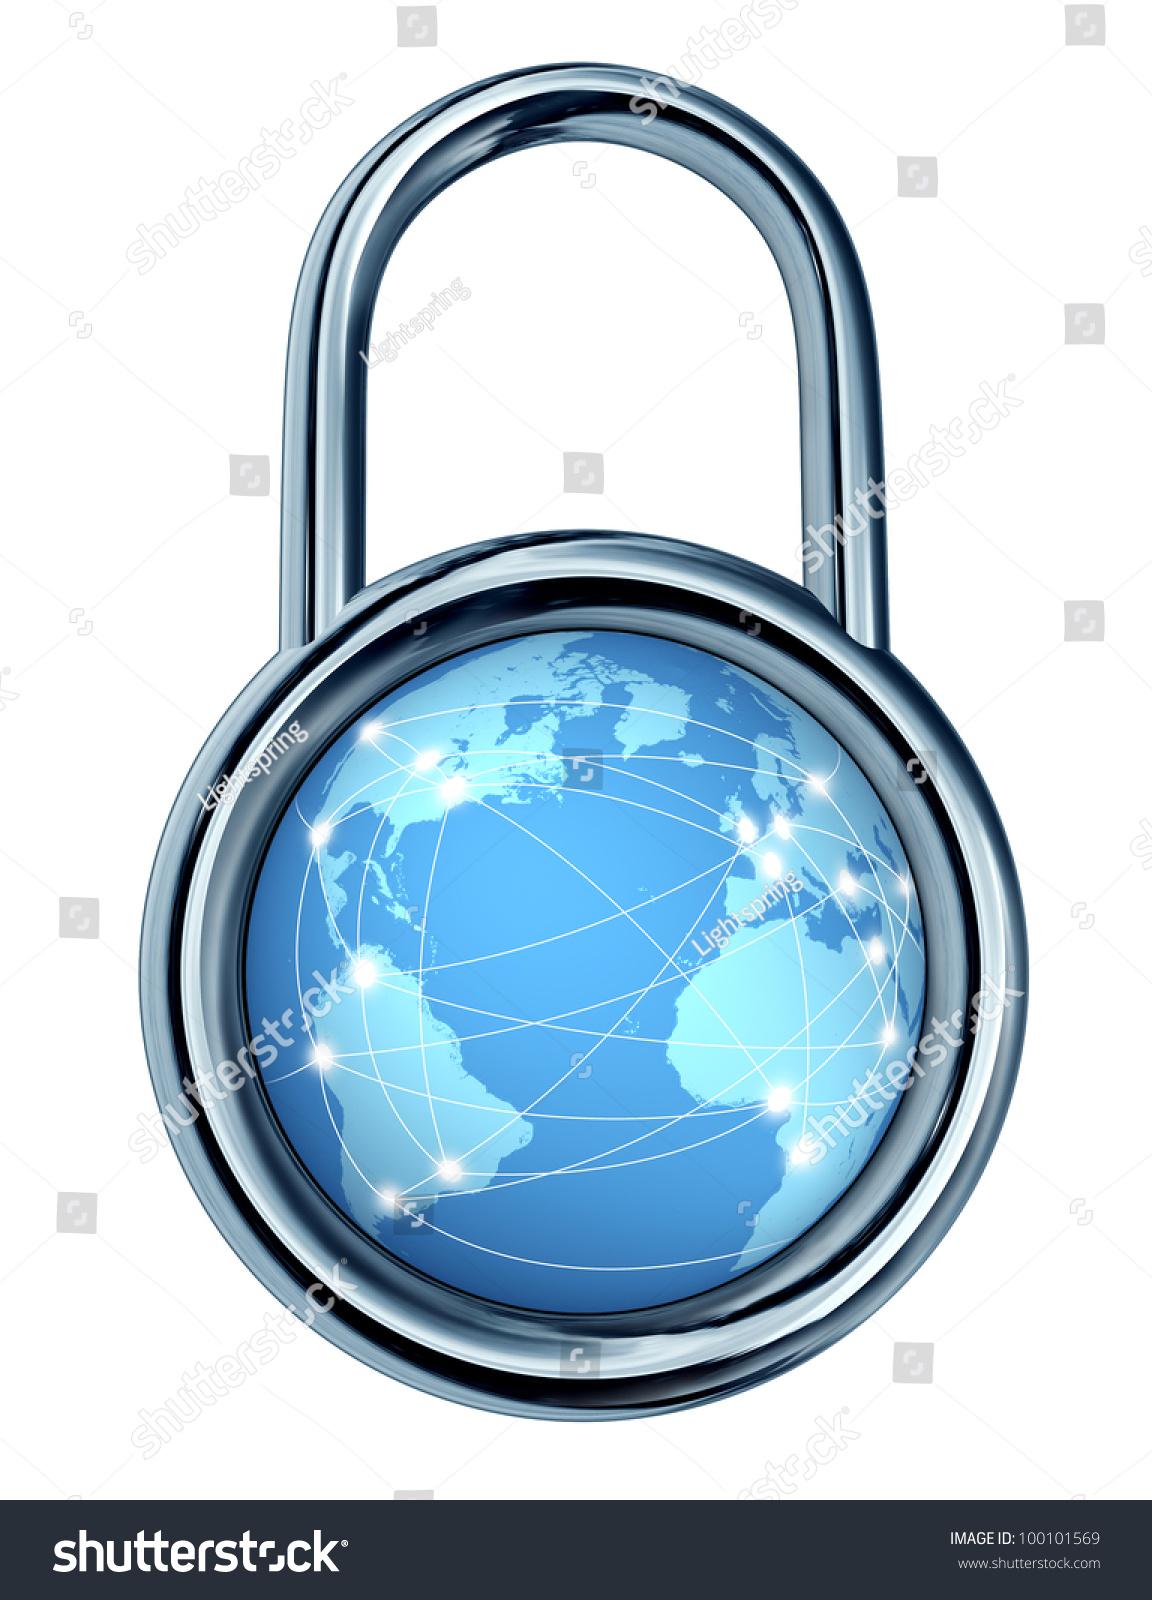 Internet Security Lock Locking Symbol Shape Stock Illustration